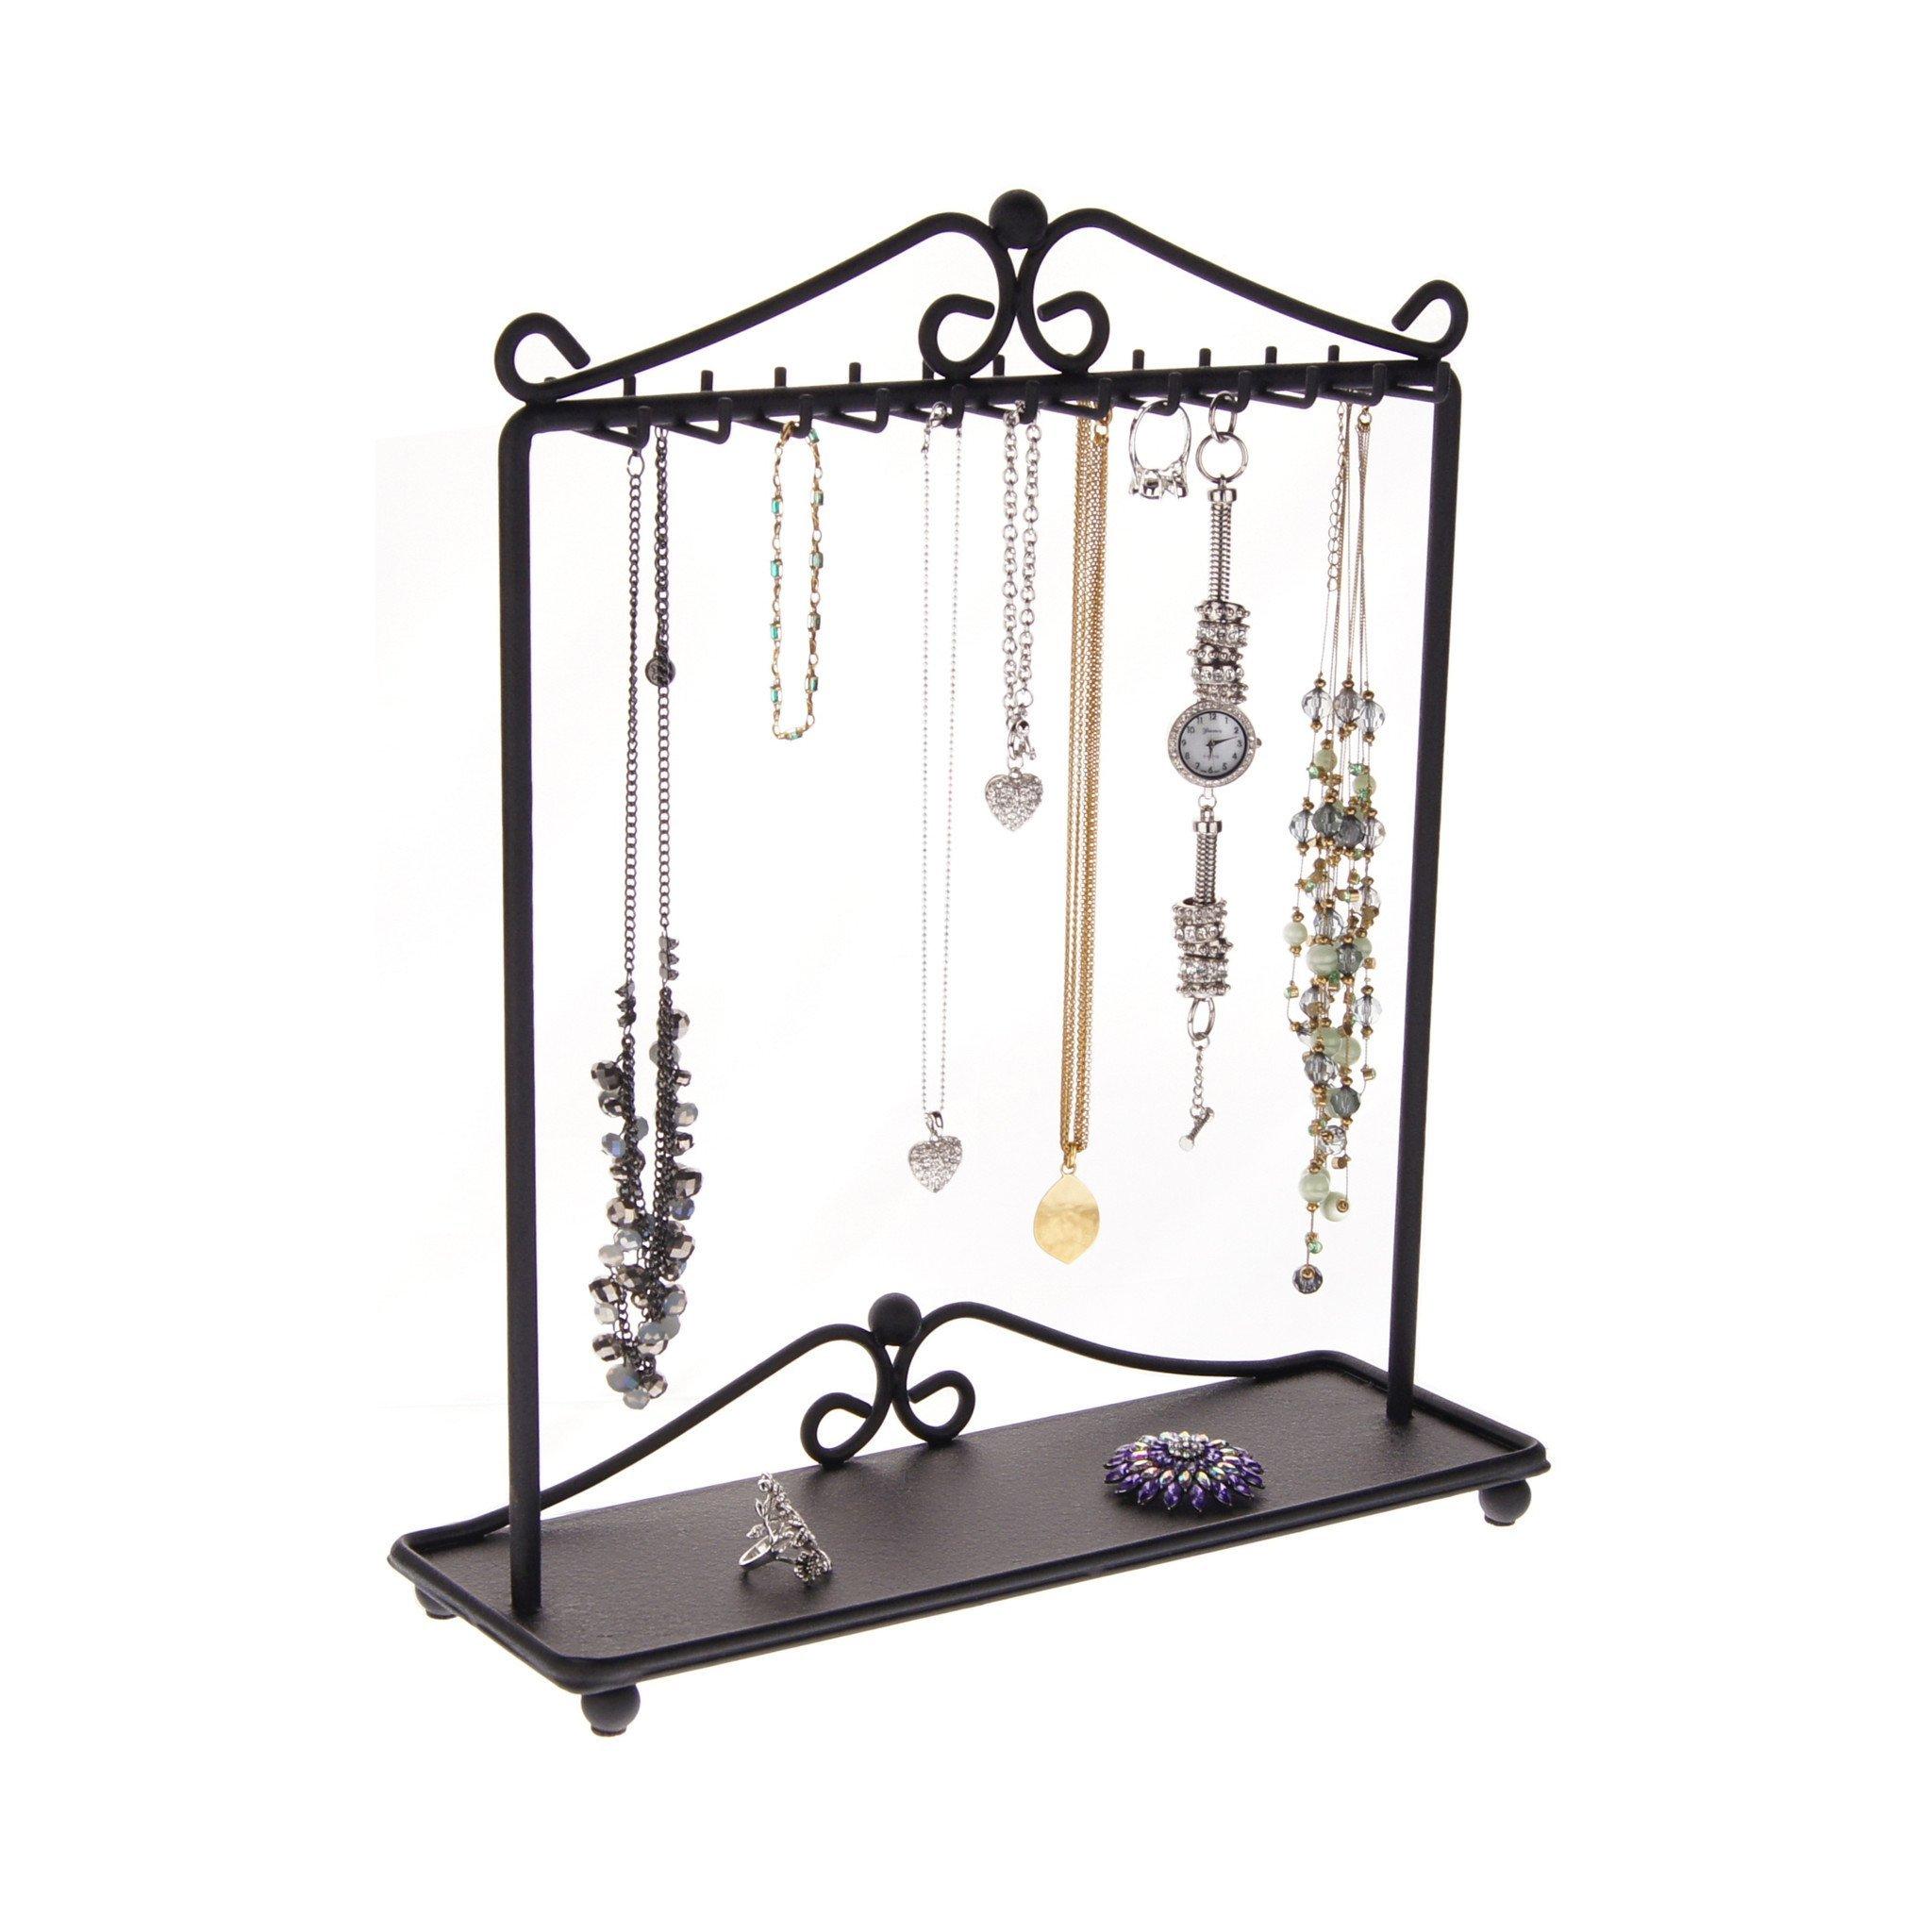 Necklace Holder Stand Jewelry Organizer Hanging Necklace Tree Bracelet Storage Rack Display, Calla Black